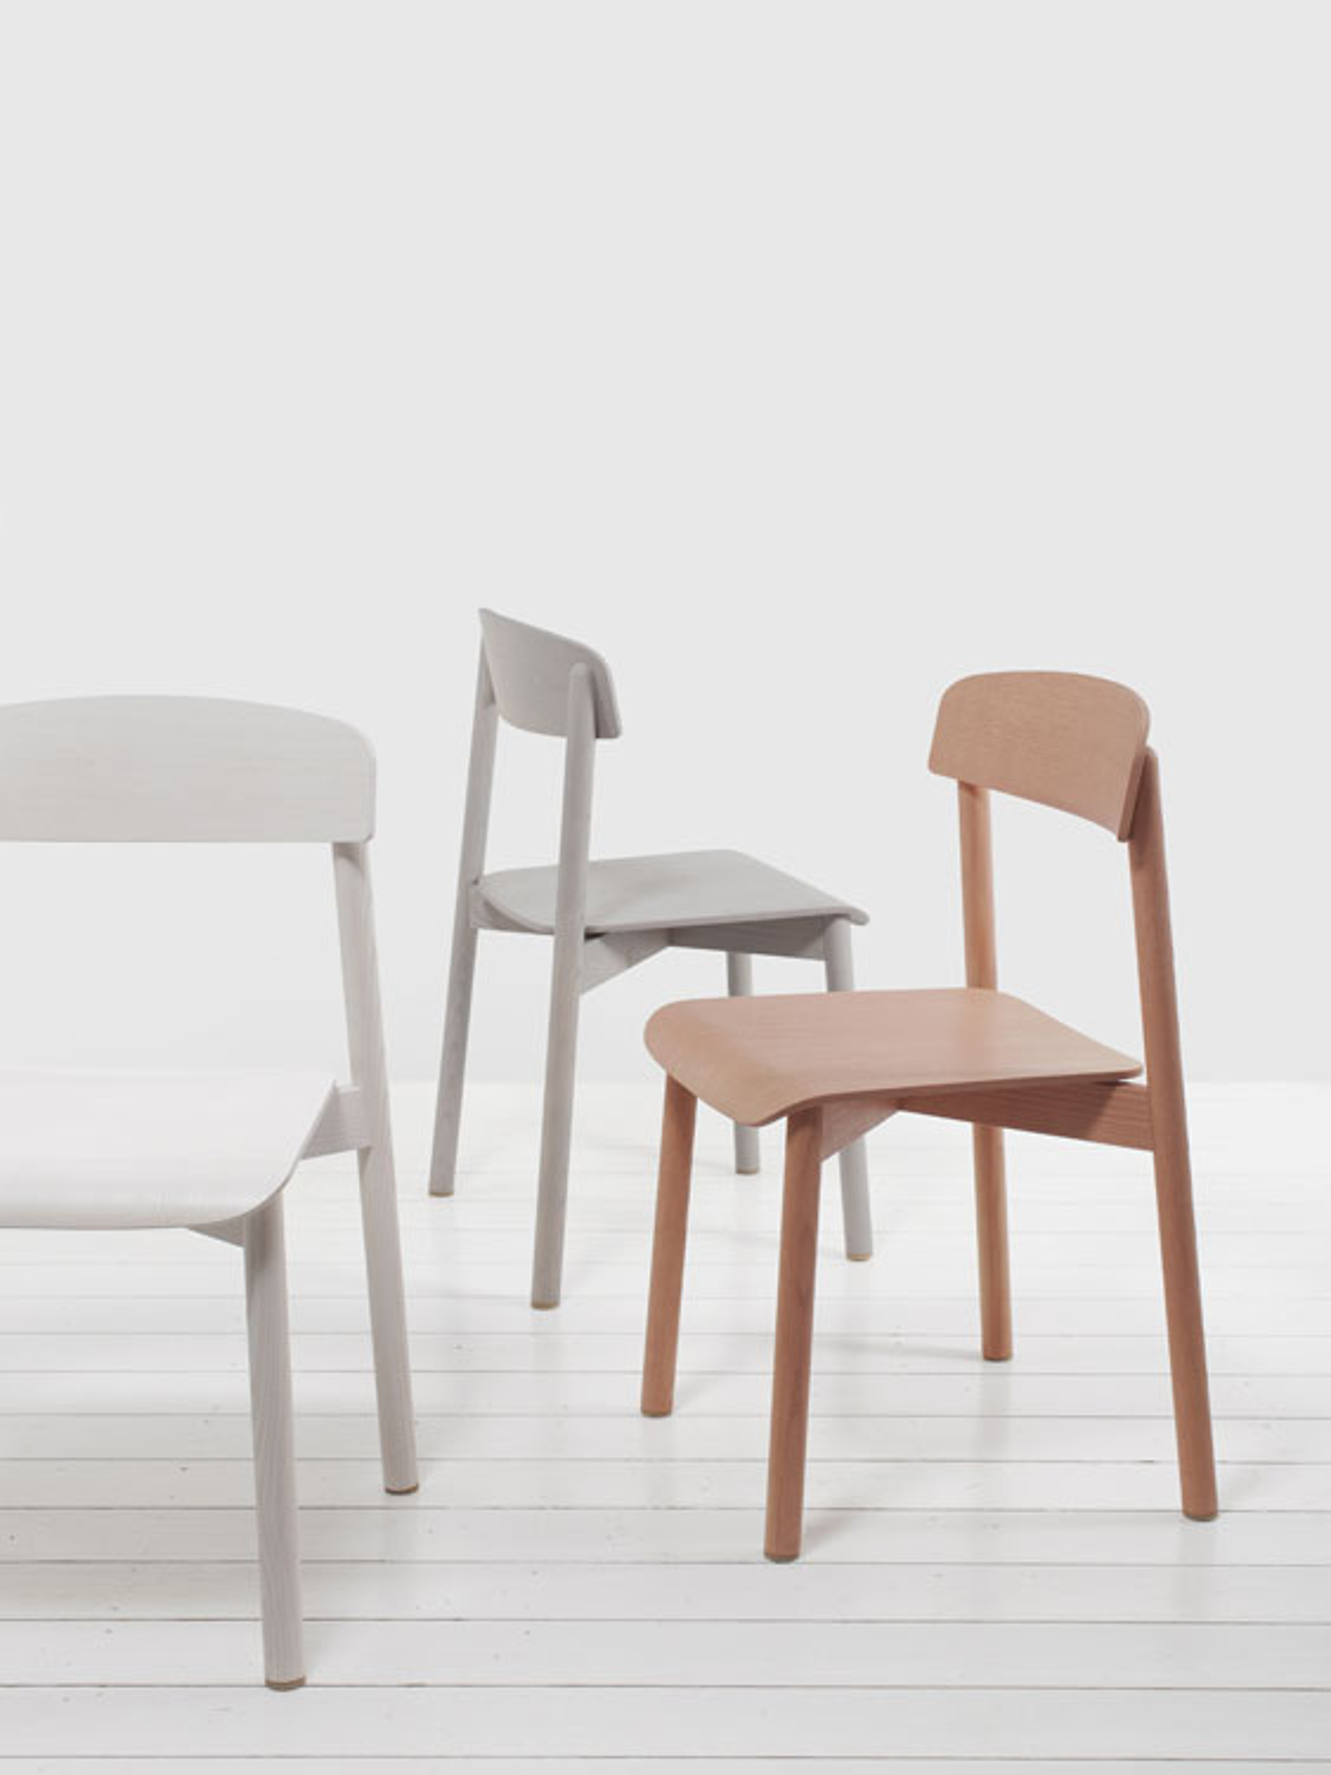 profile chair stapelstuhl aus holz von stattmann i holzdesignpur. Black Bedroom Furniture Sets. Home Design Ideas